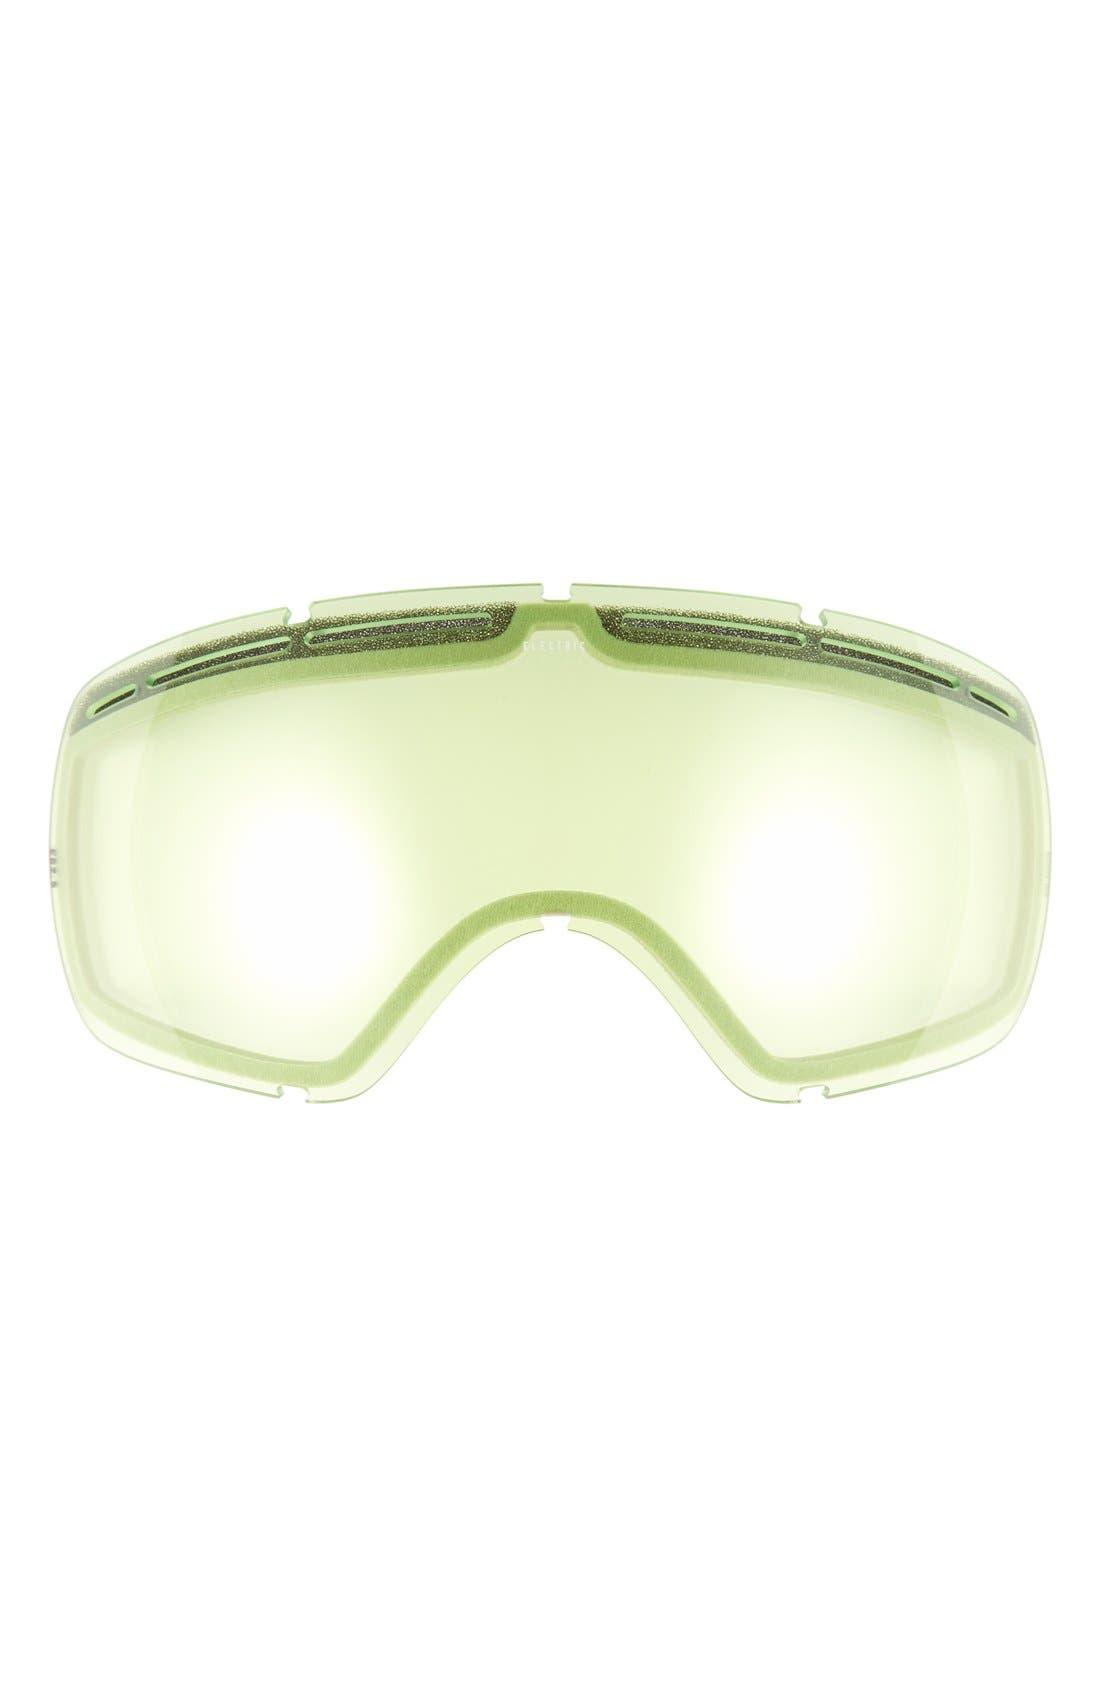 EG 2.5 215mm Snow Goggles,                             Alternate thumbnail 19, color,